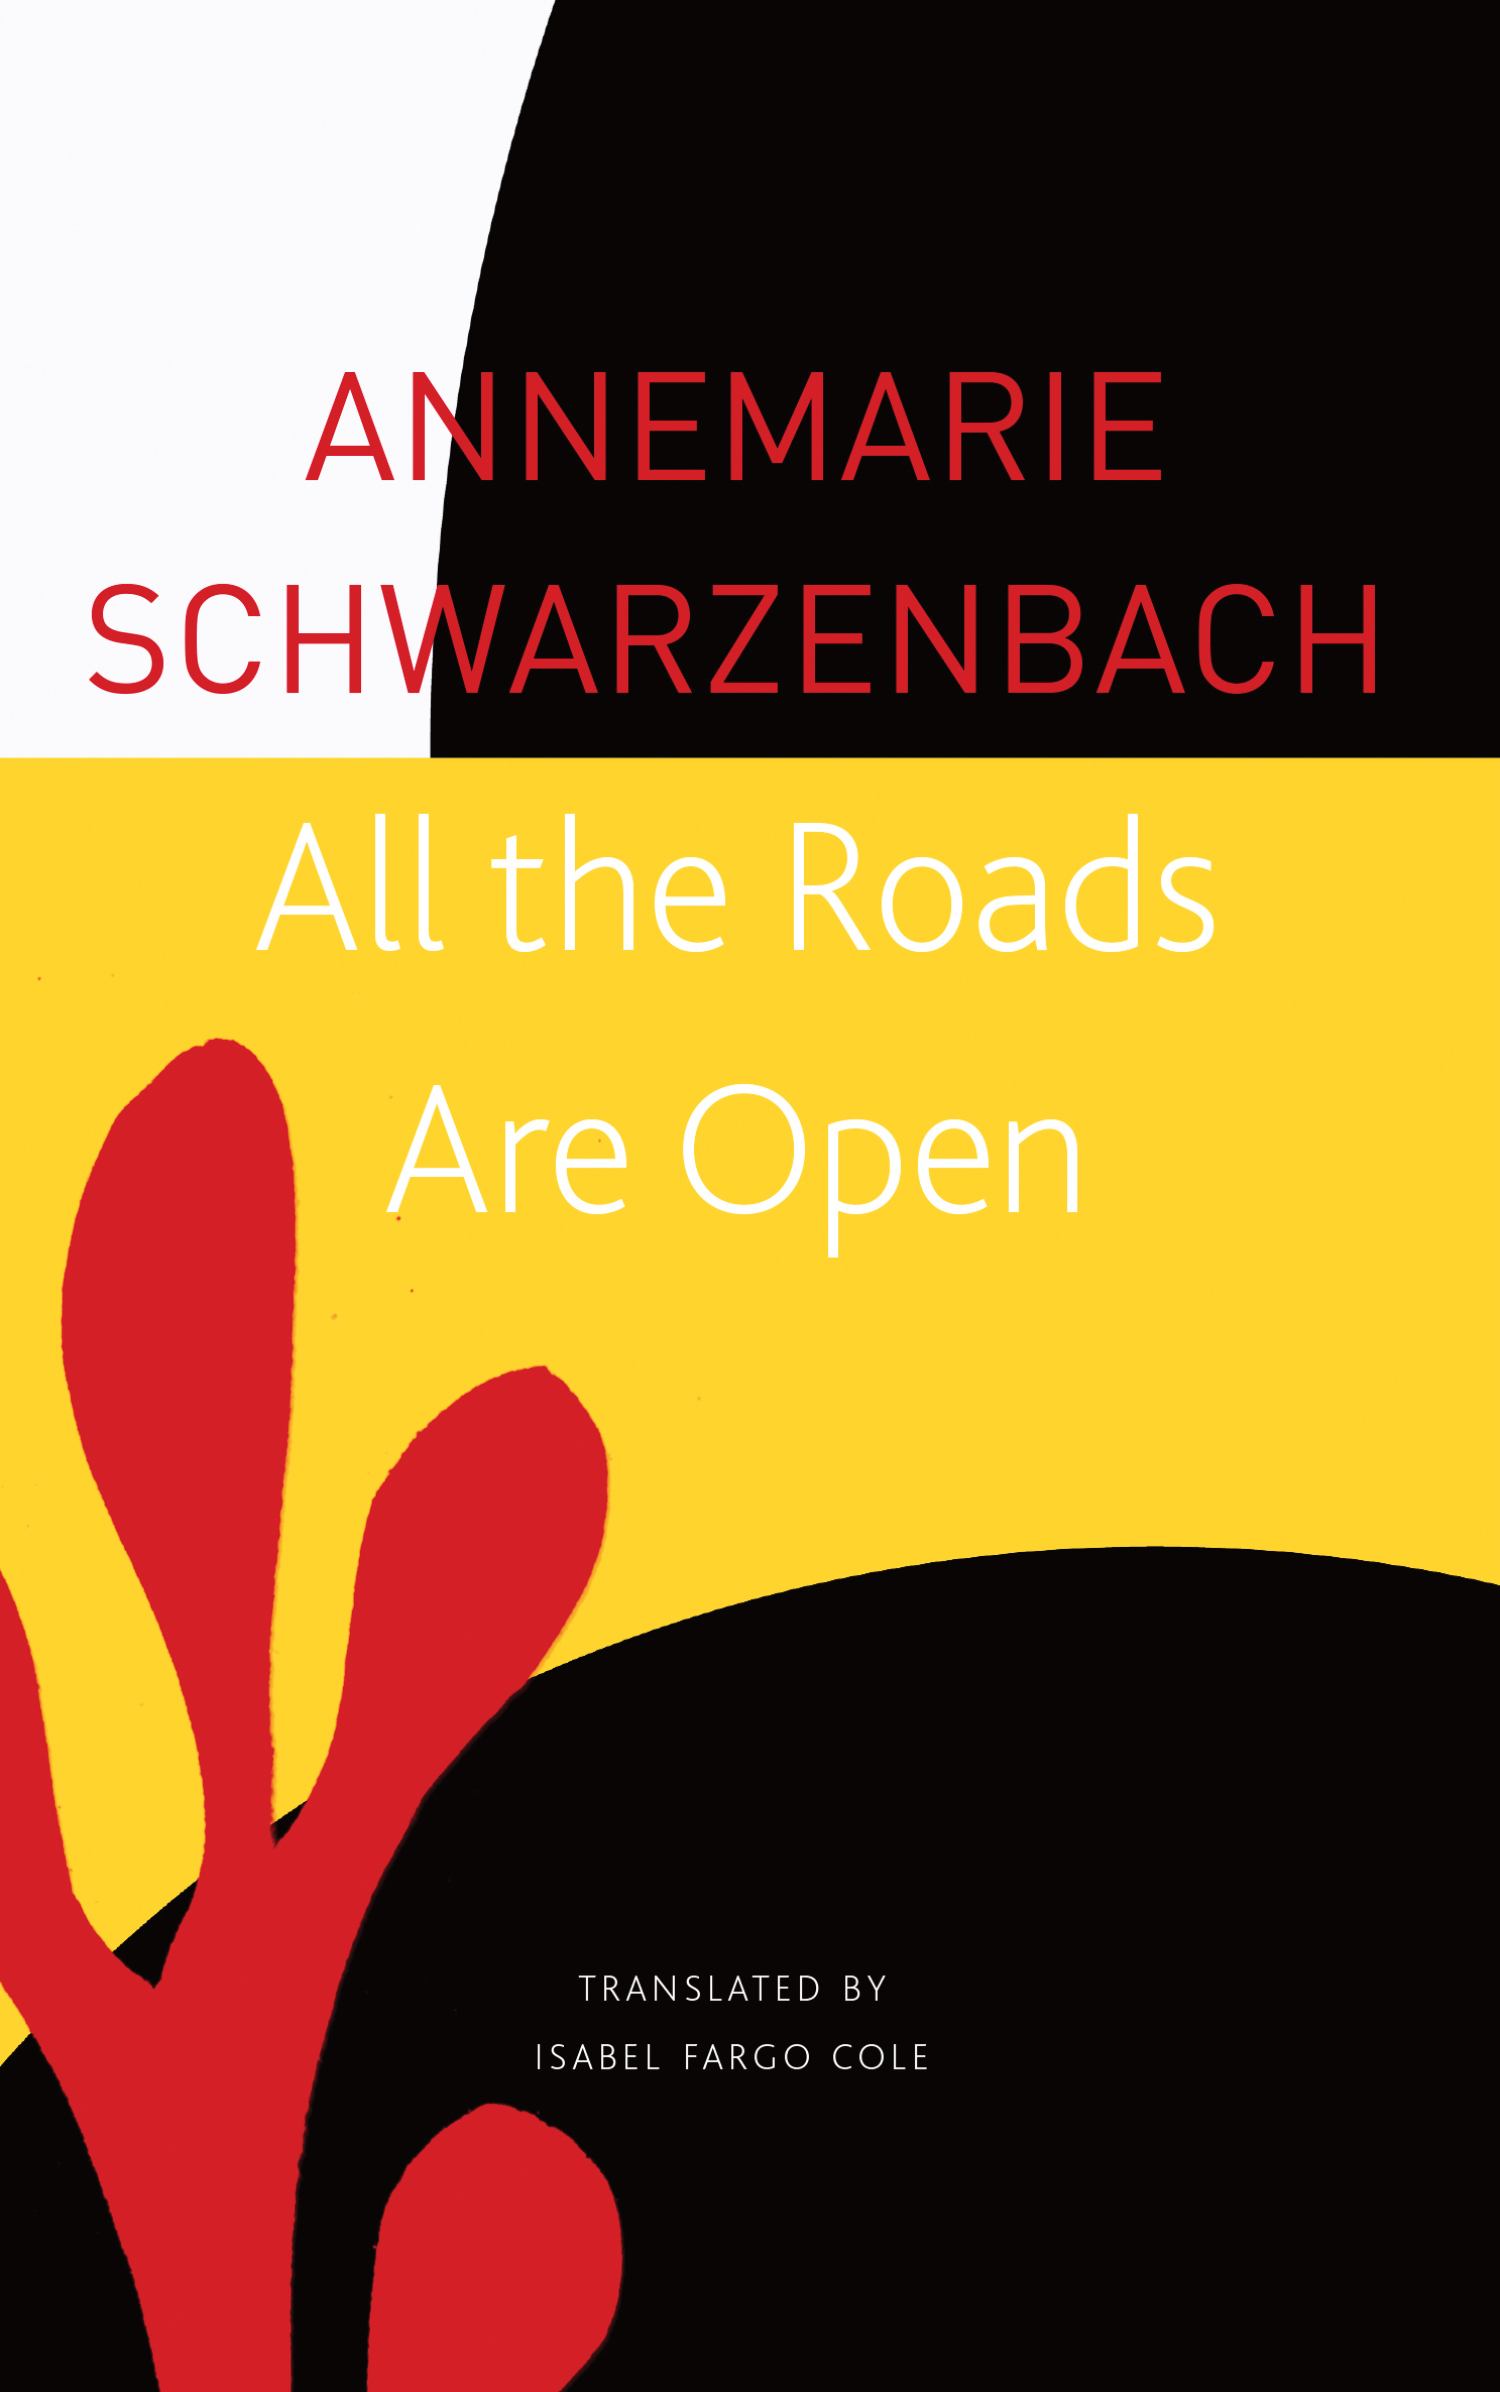 All the Roads Are Open by Annemarie Schwarzenbach | Seagull Books